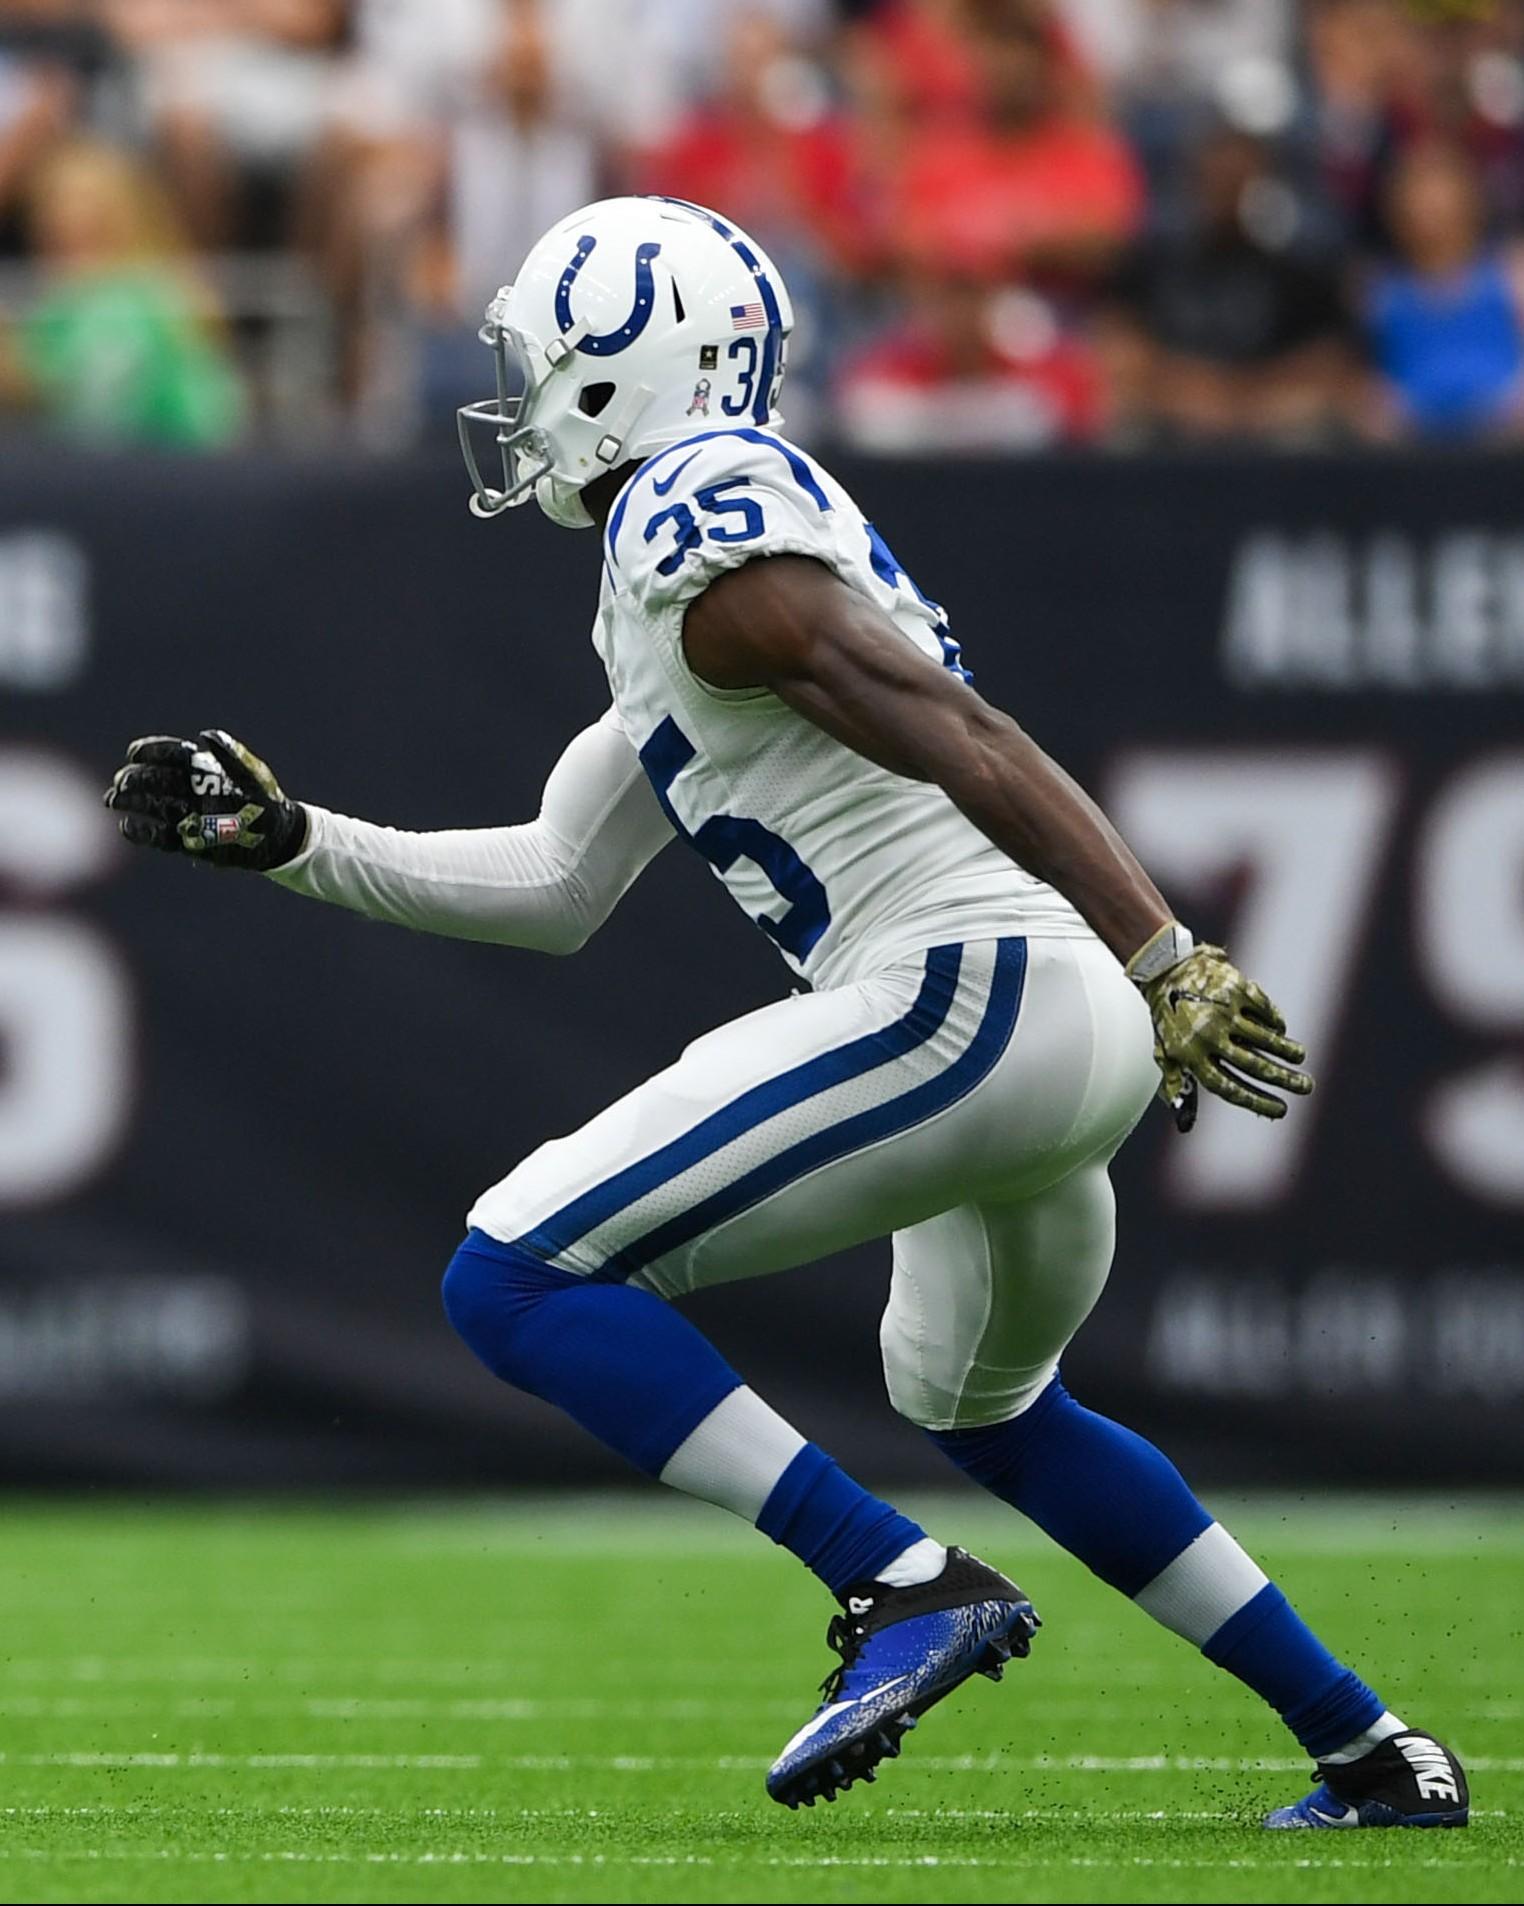 Colts Re-Sign CB Pierre Desir